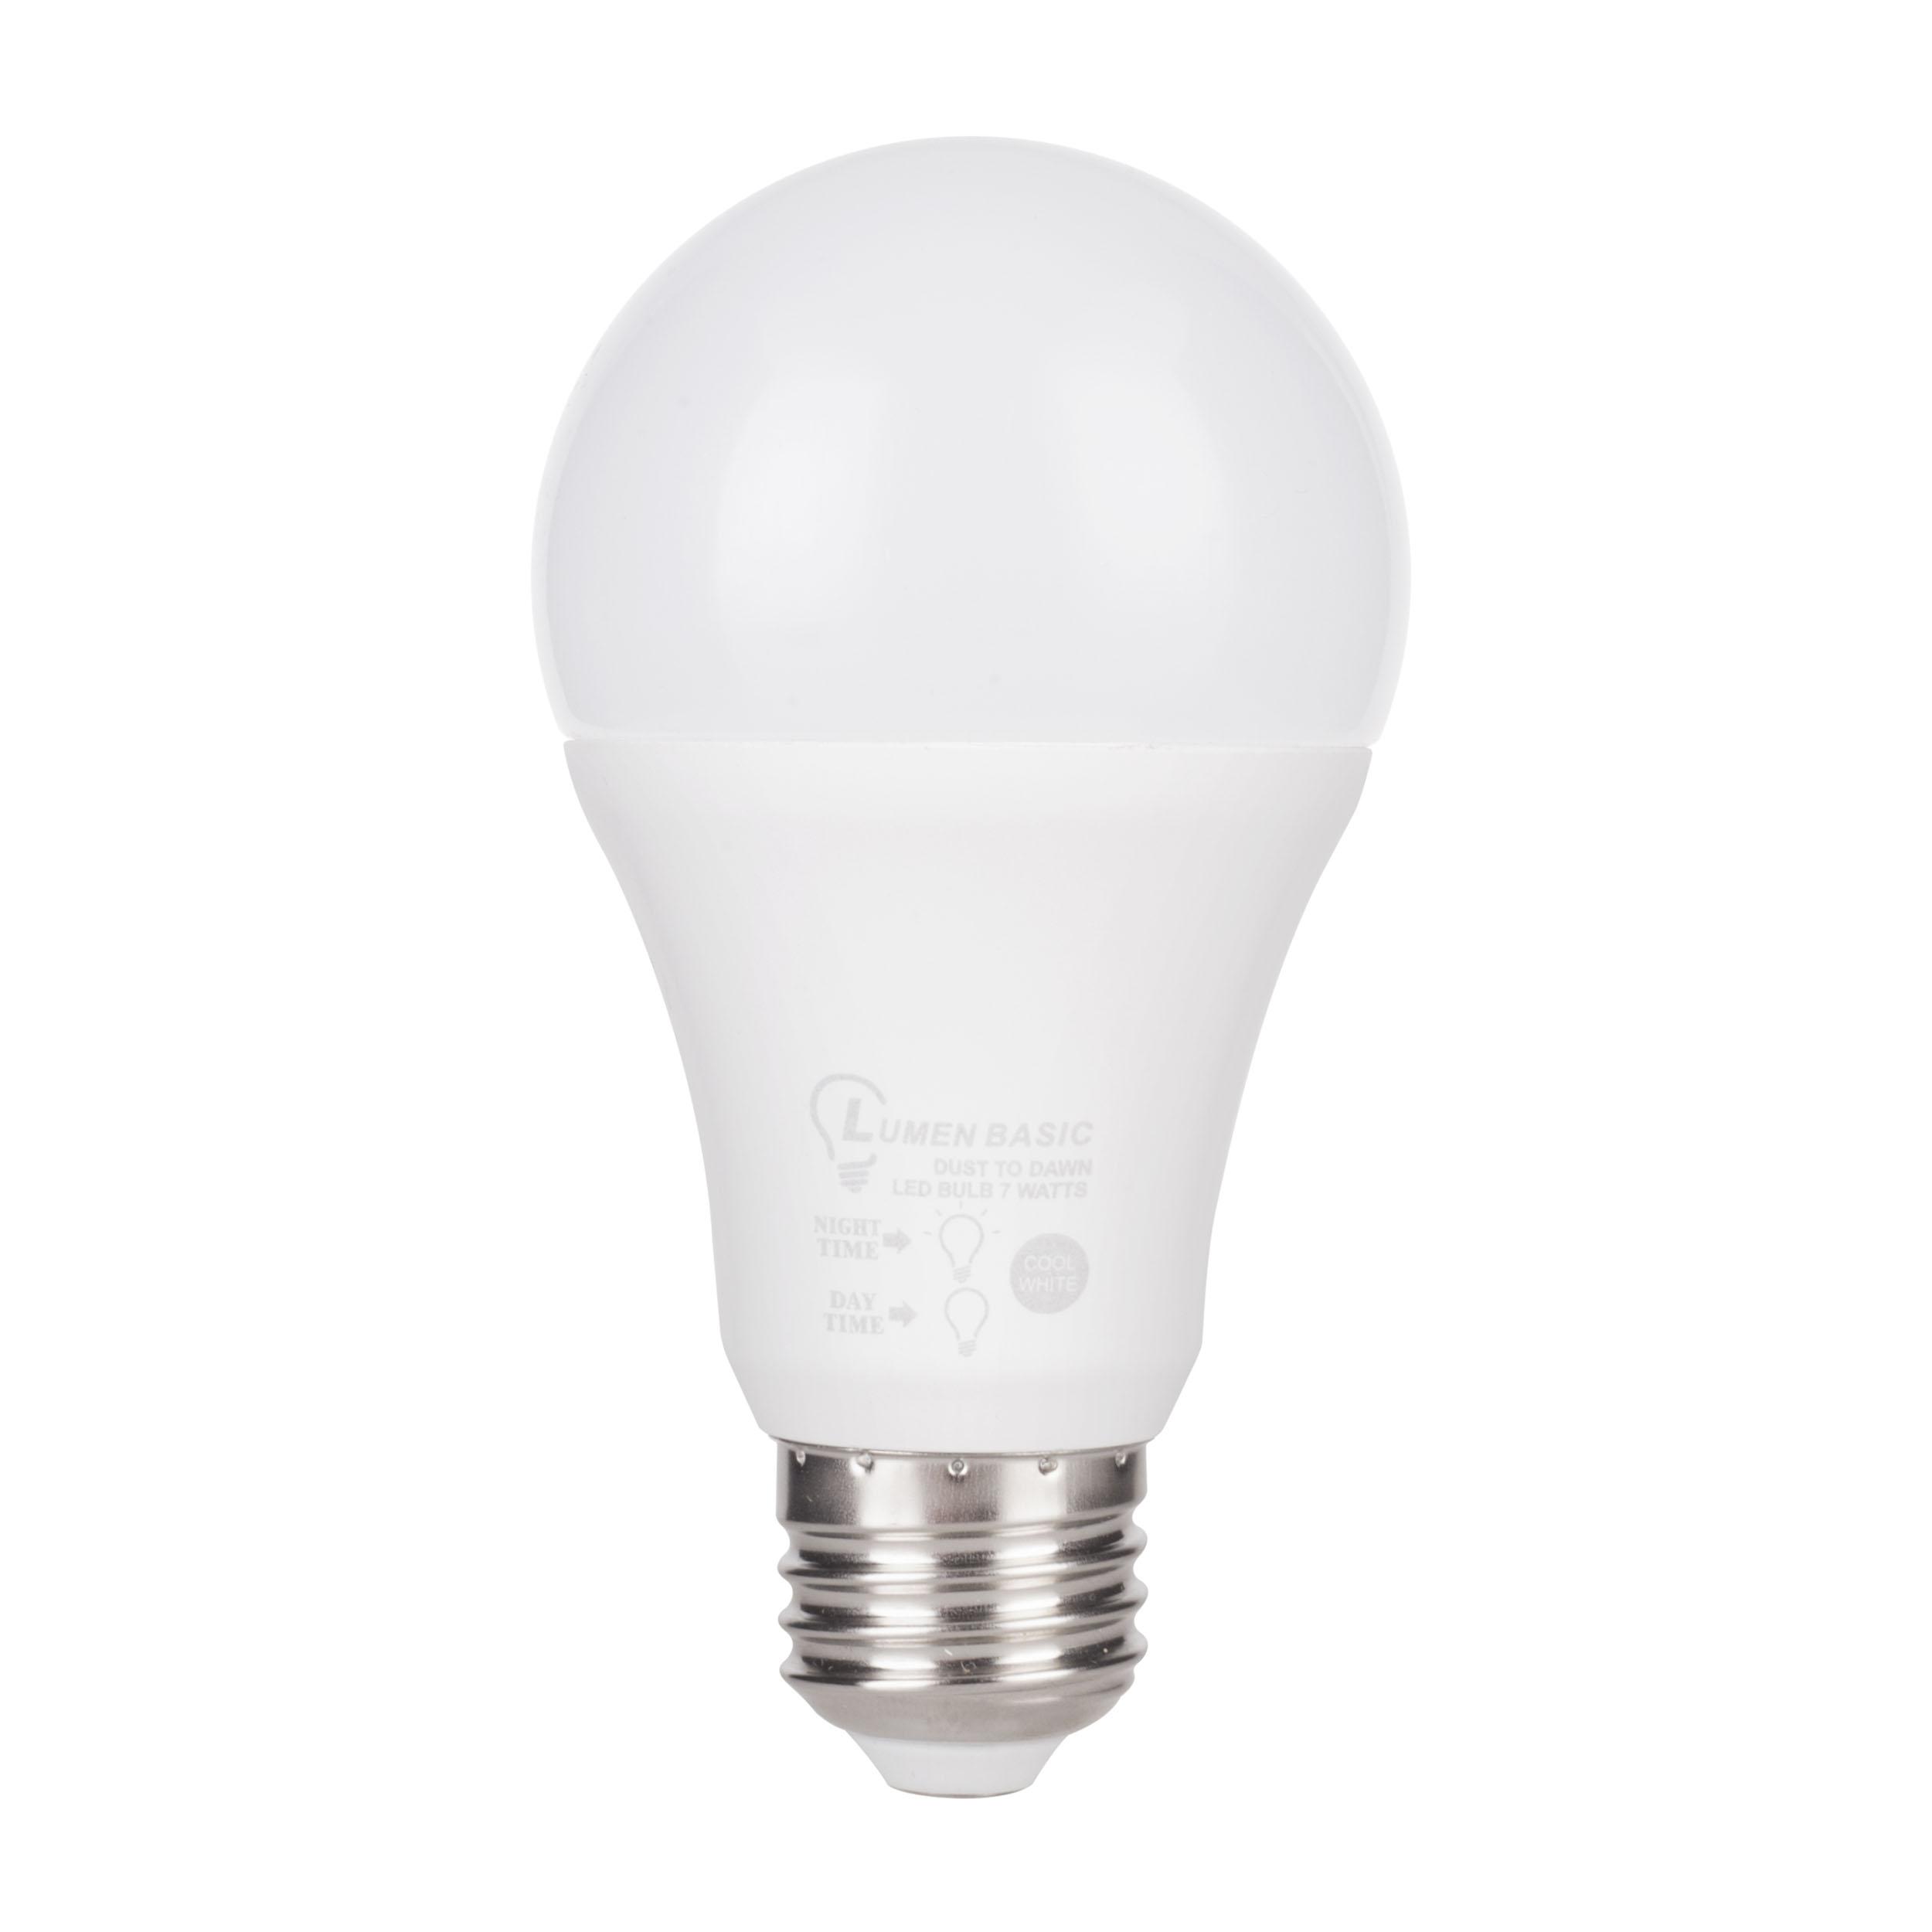 Led 60 Watt Equivalent Light Bulbs